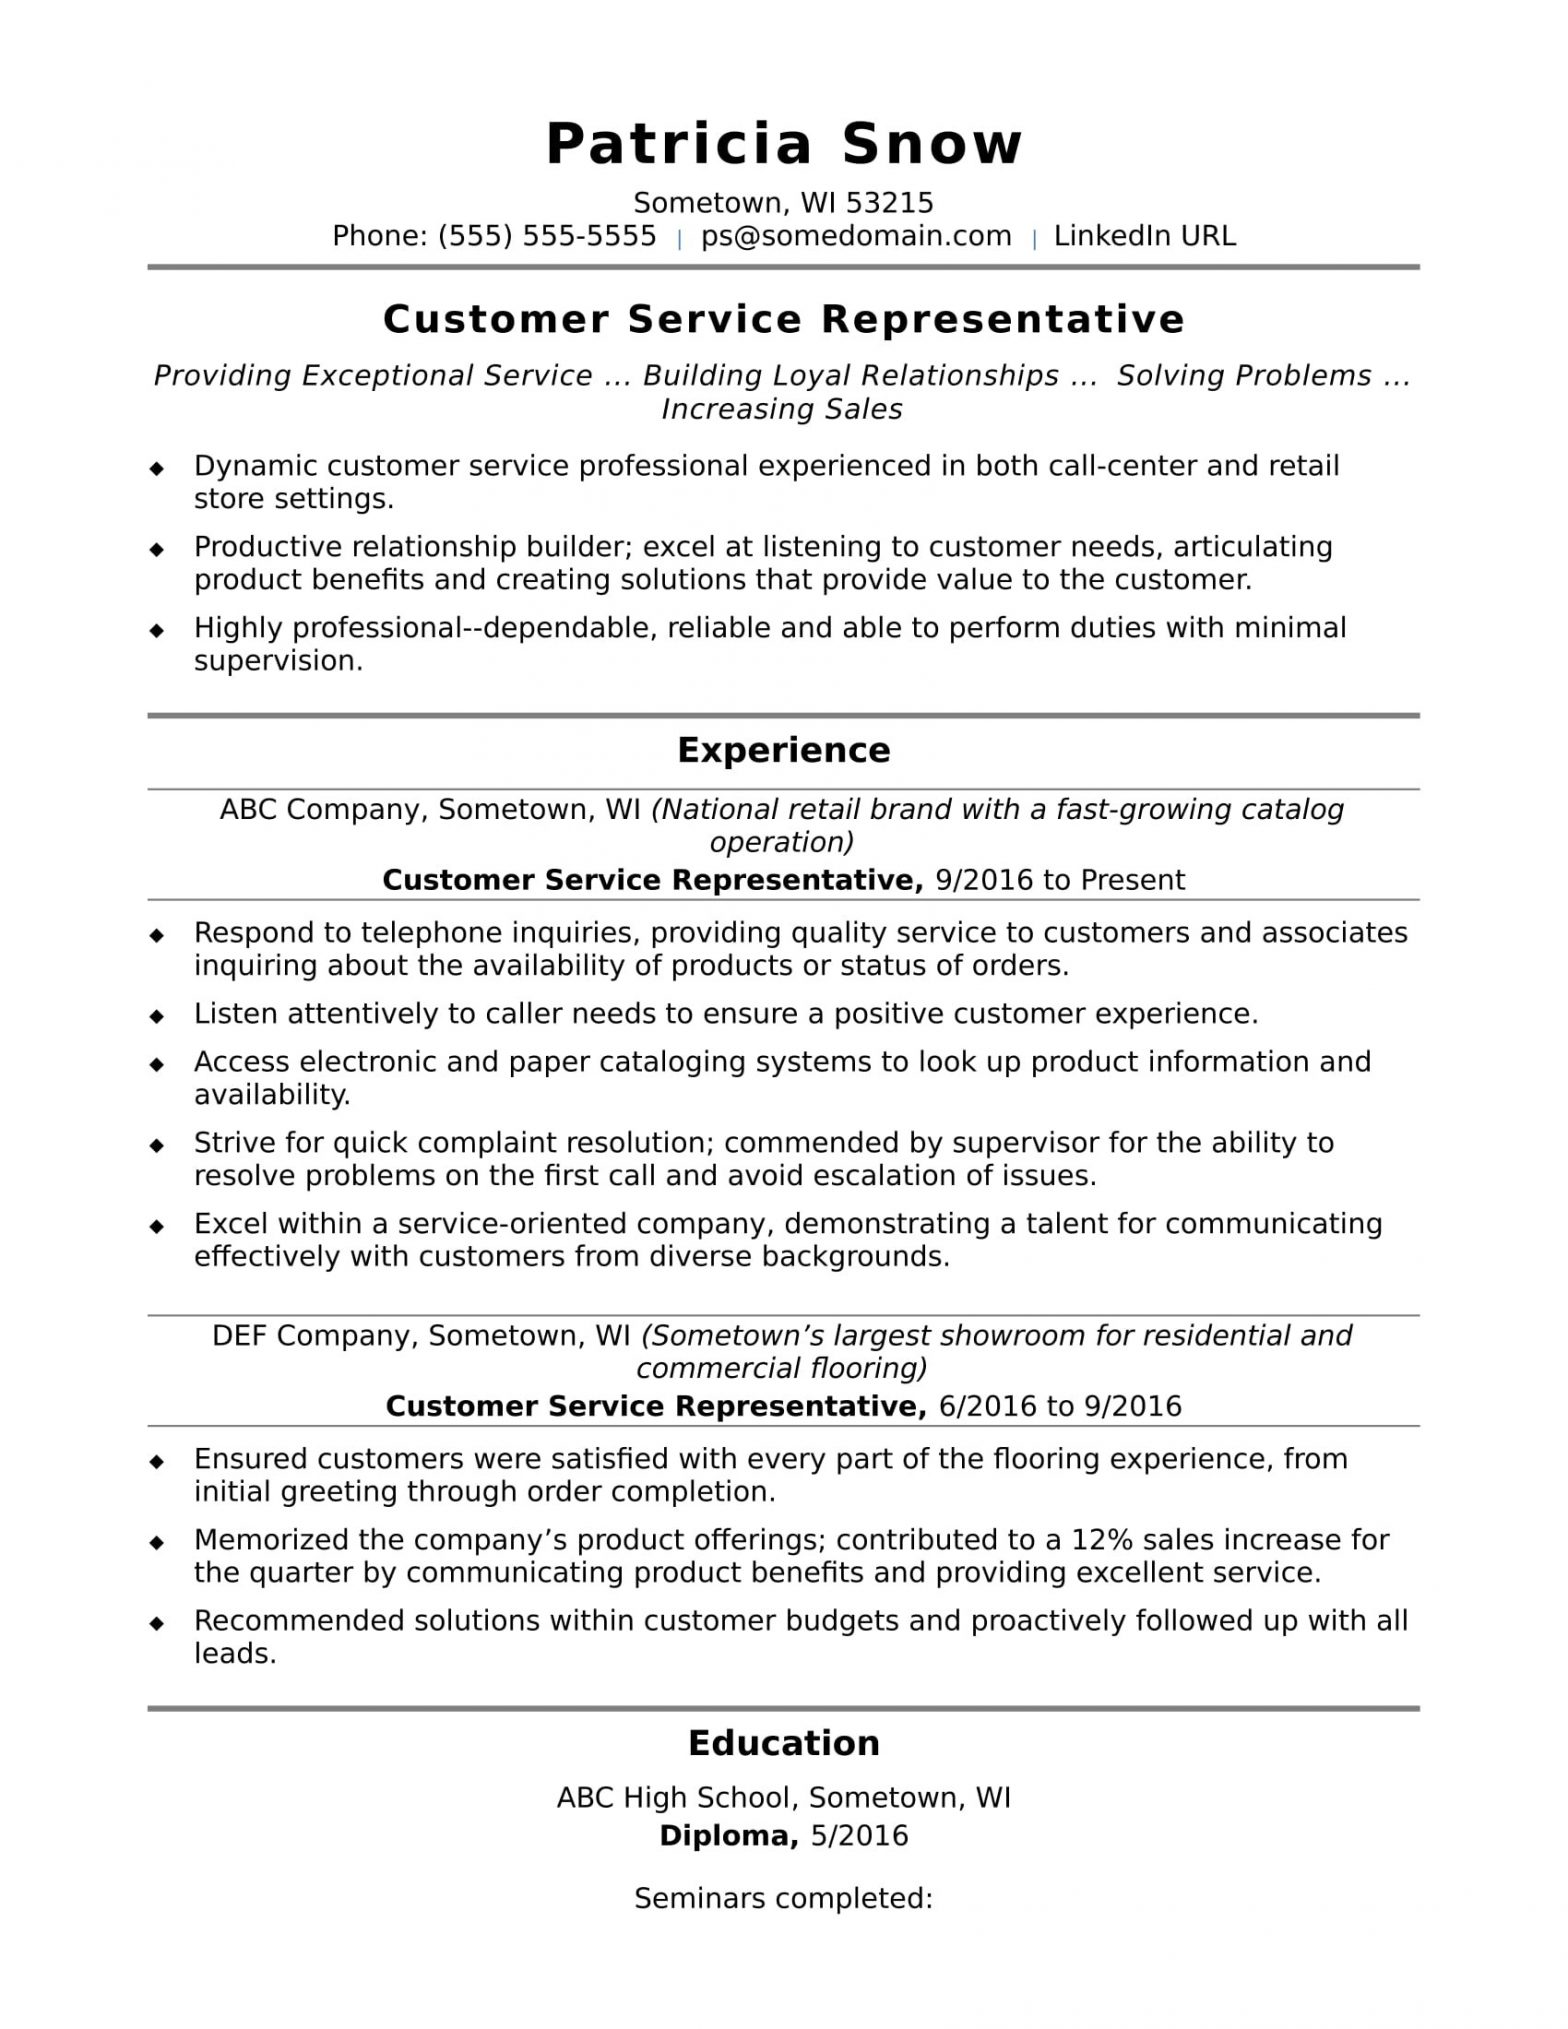 Resume Samples for Customer Service Skills Customer Service Representative Resume Sample Monster.com